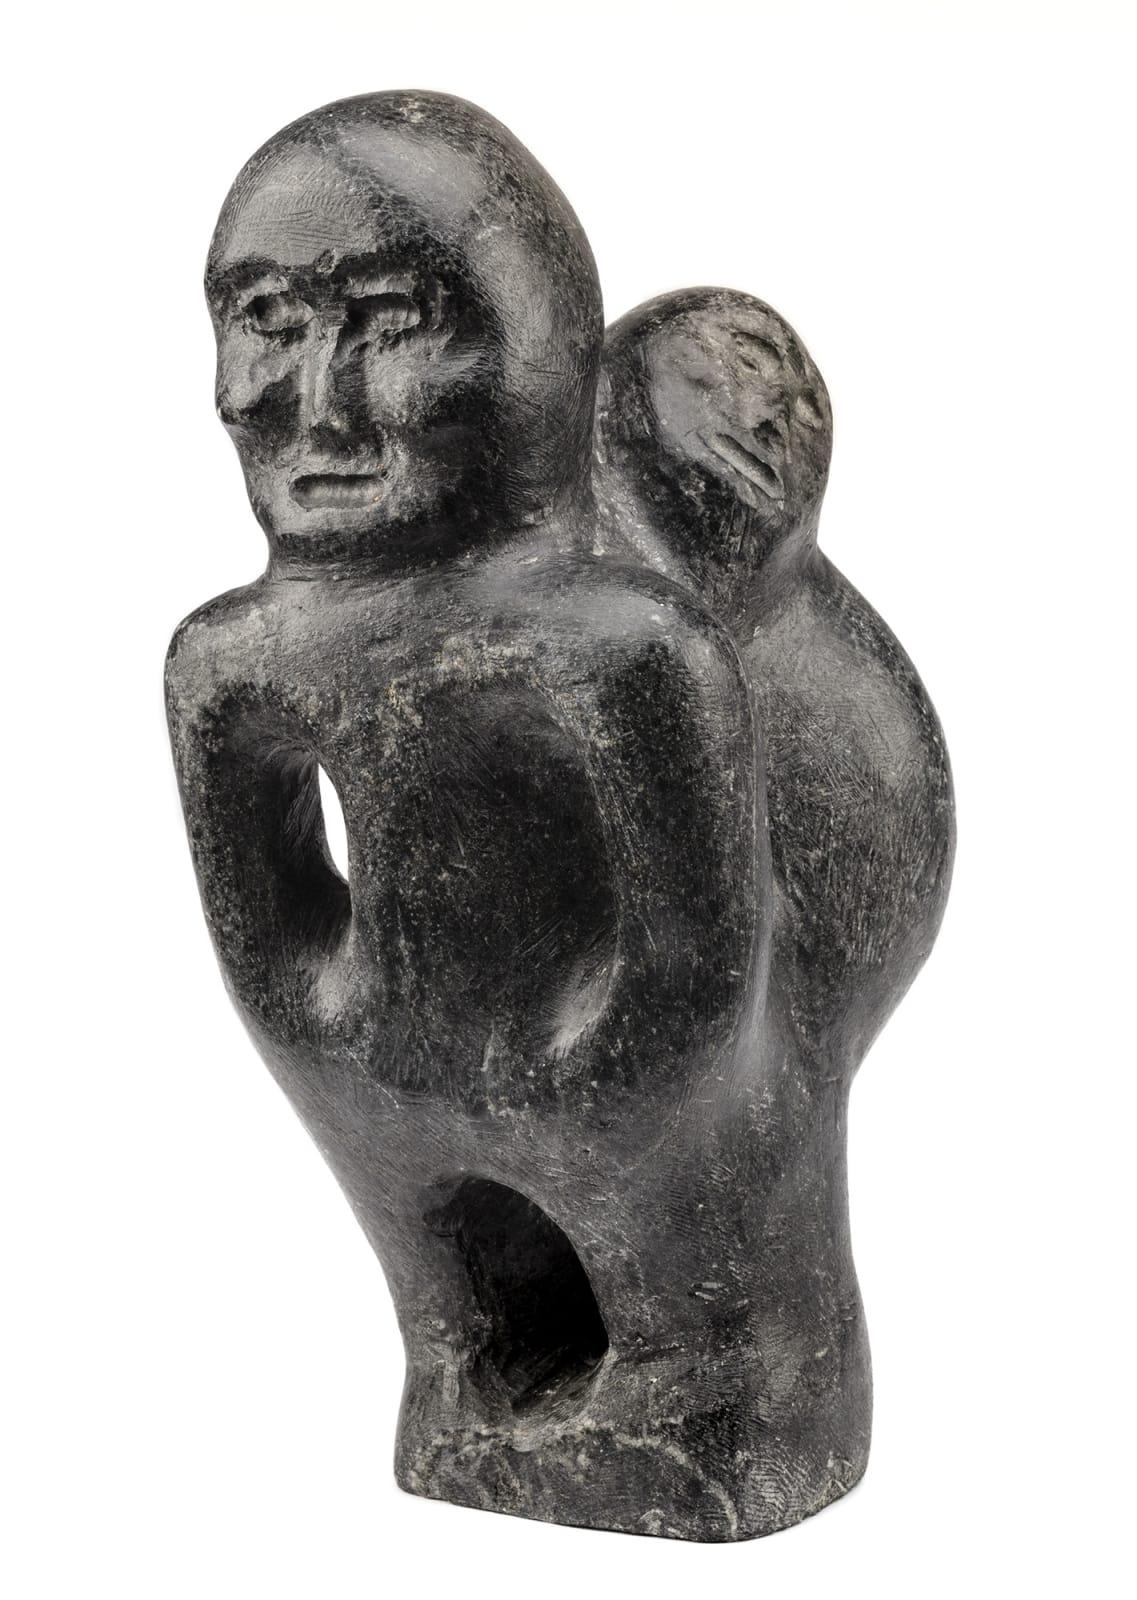 Lot 90 JOHN TIKTAK, R.C.A. (1916-1981) KANGIQLINIQ (RANKIN INLET) Mother and Child, early 1970s stone, 9.5 x 4 x 4 in (24.1 x 10.2 x 10.2 cm) Estimate: $20,000— $30,000